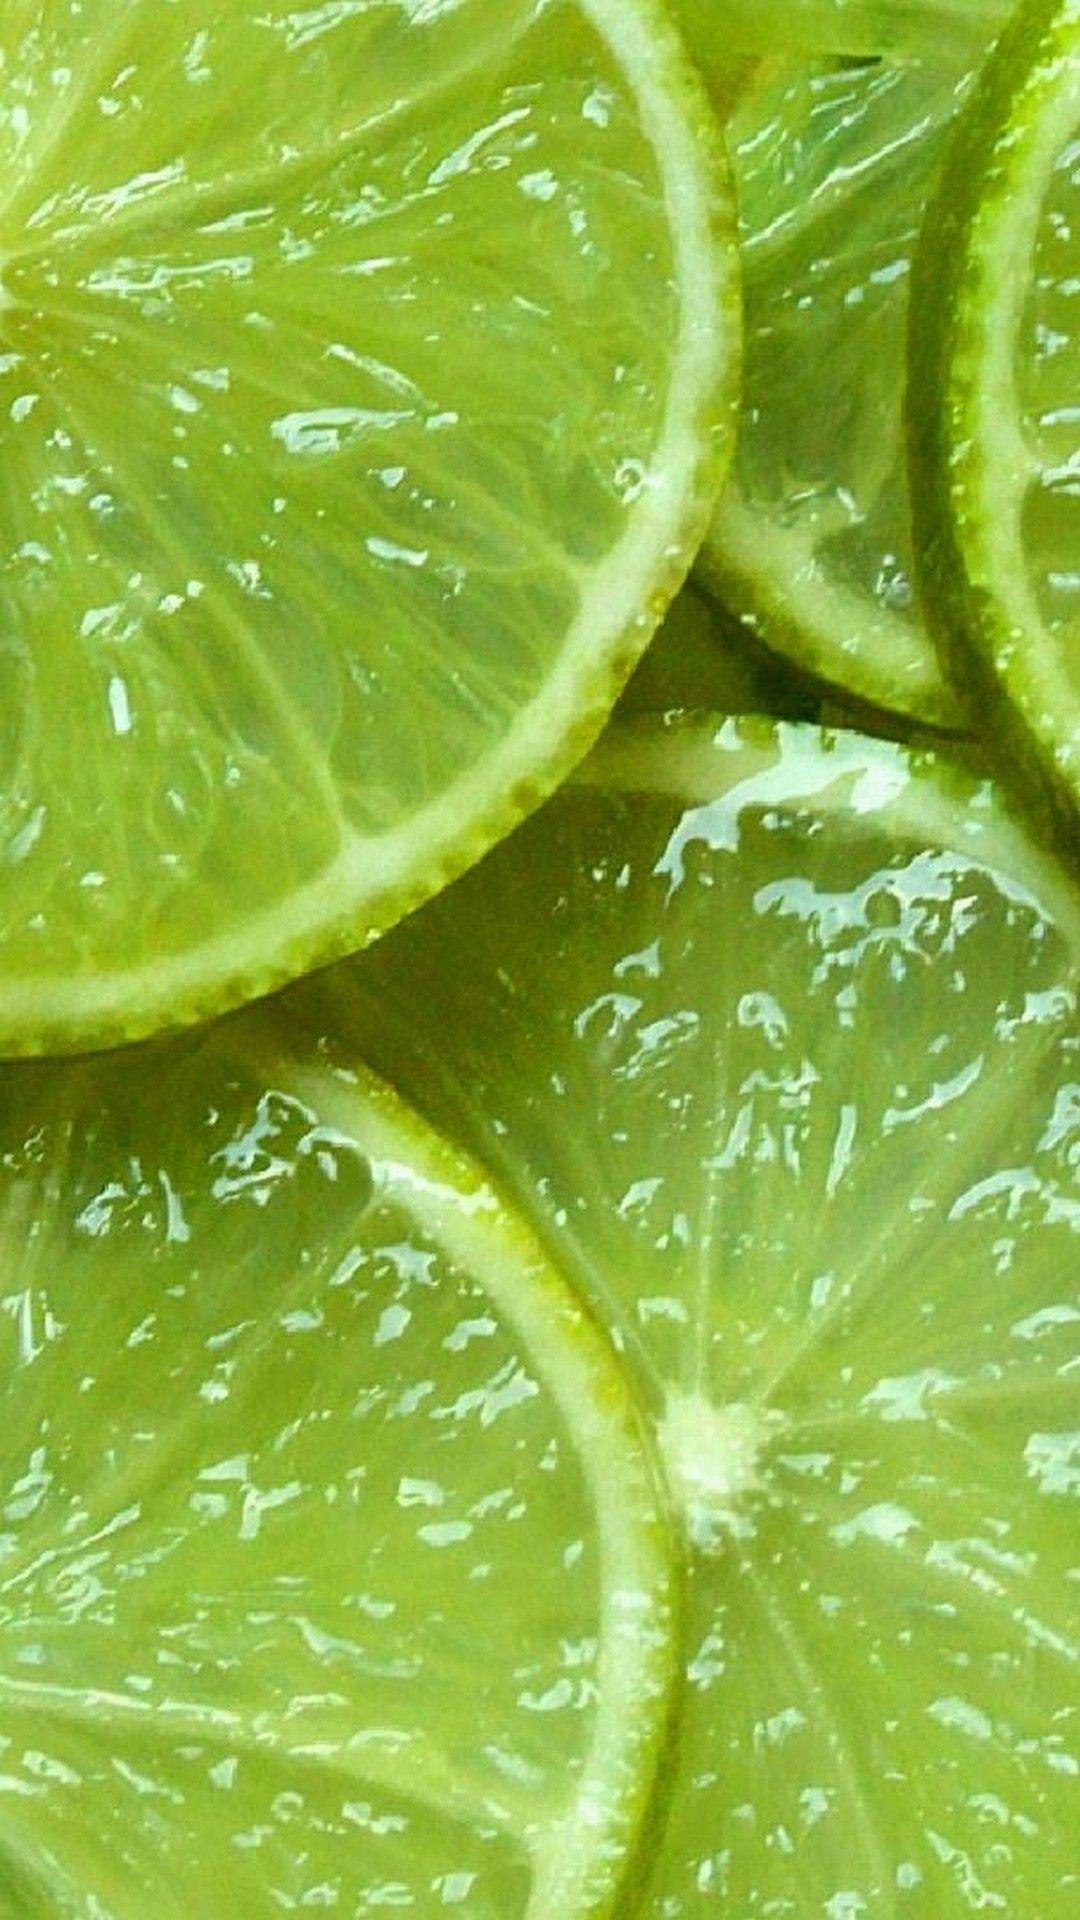 wallpaper lime green android - 2019 | hintergrundbilder | fruit